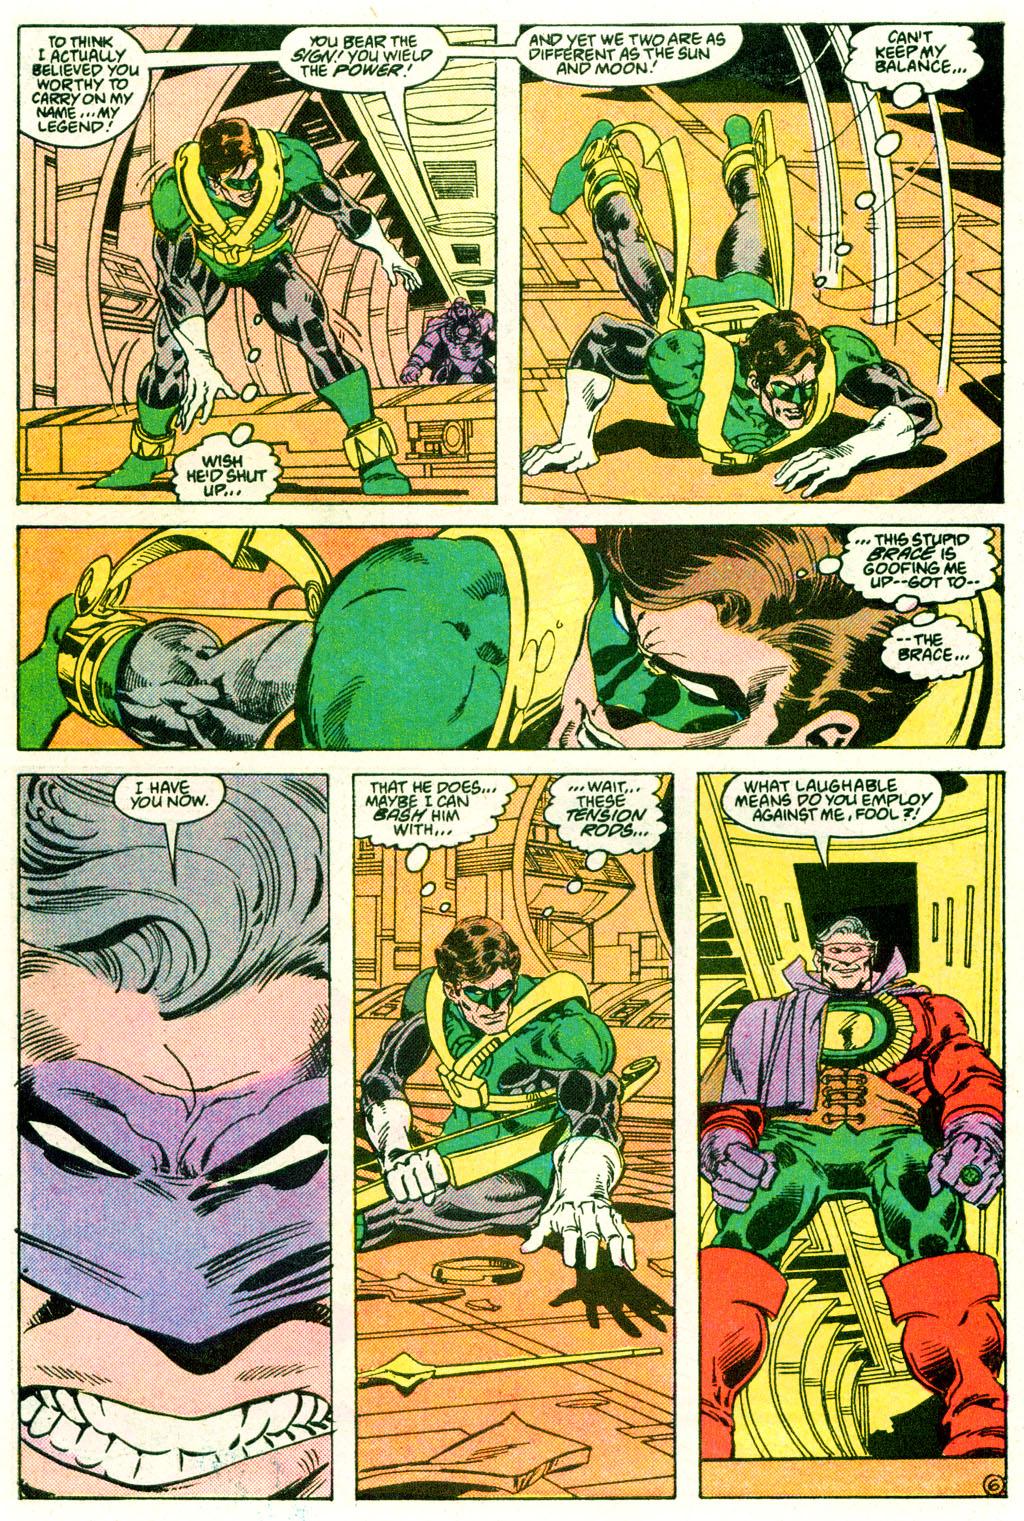 Action Comics (1938) 635 Page 37